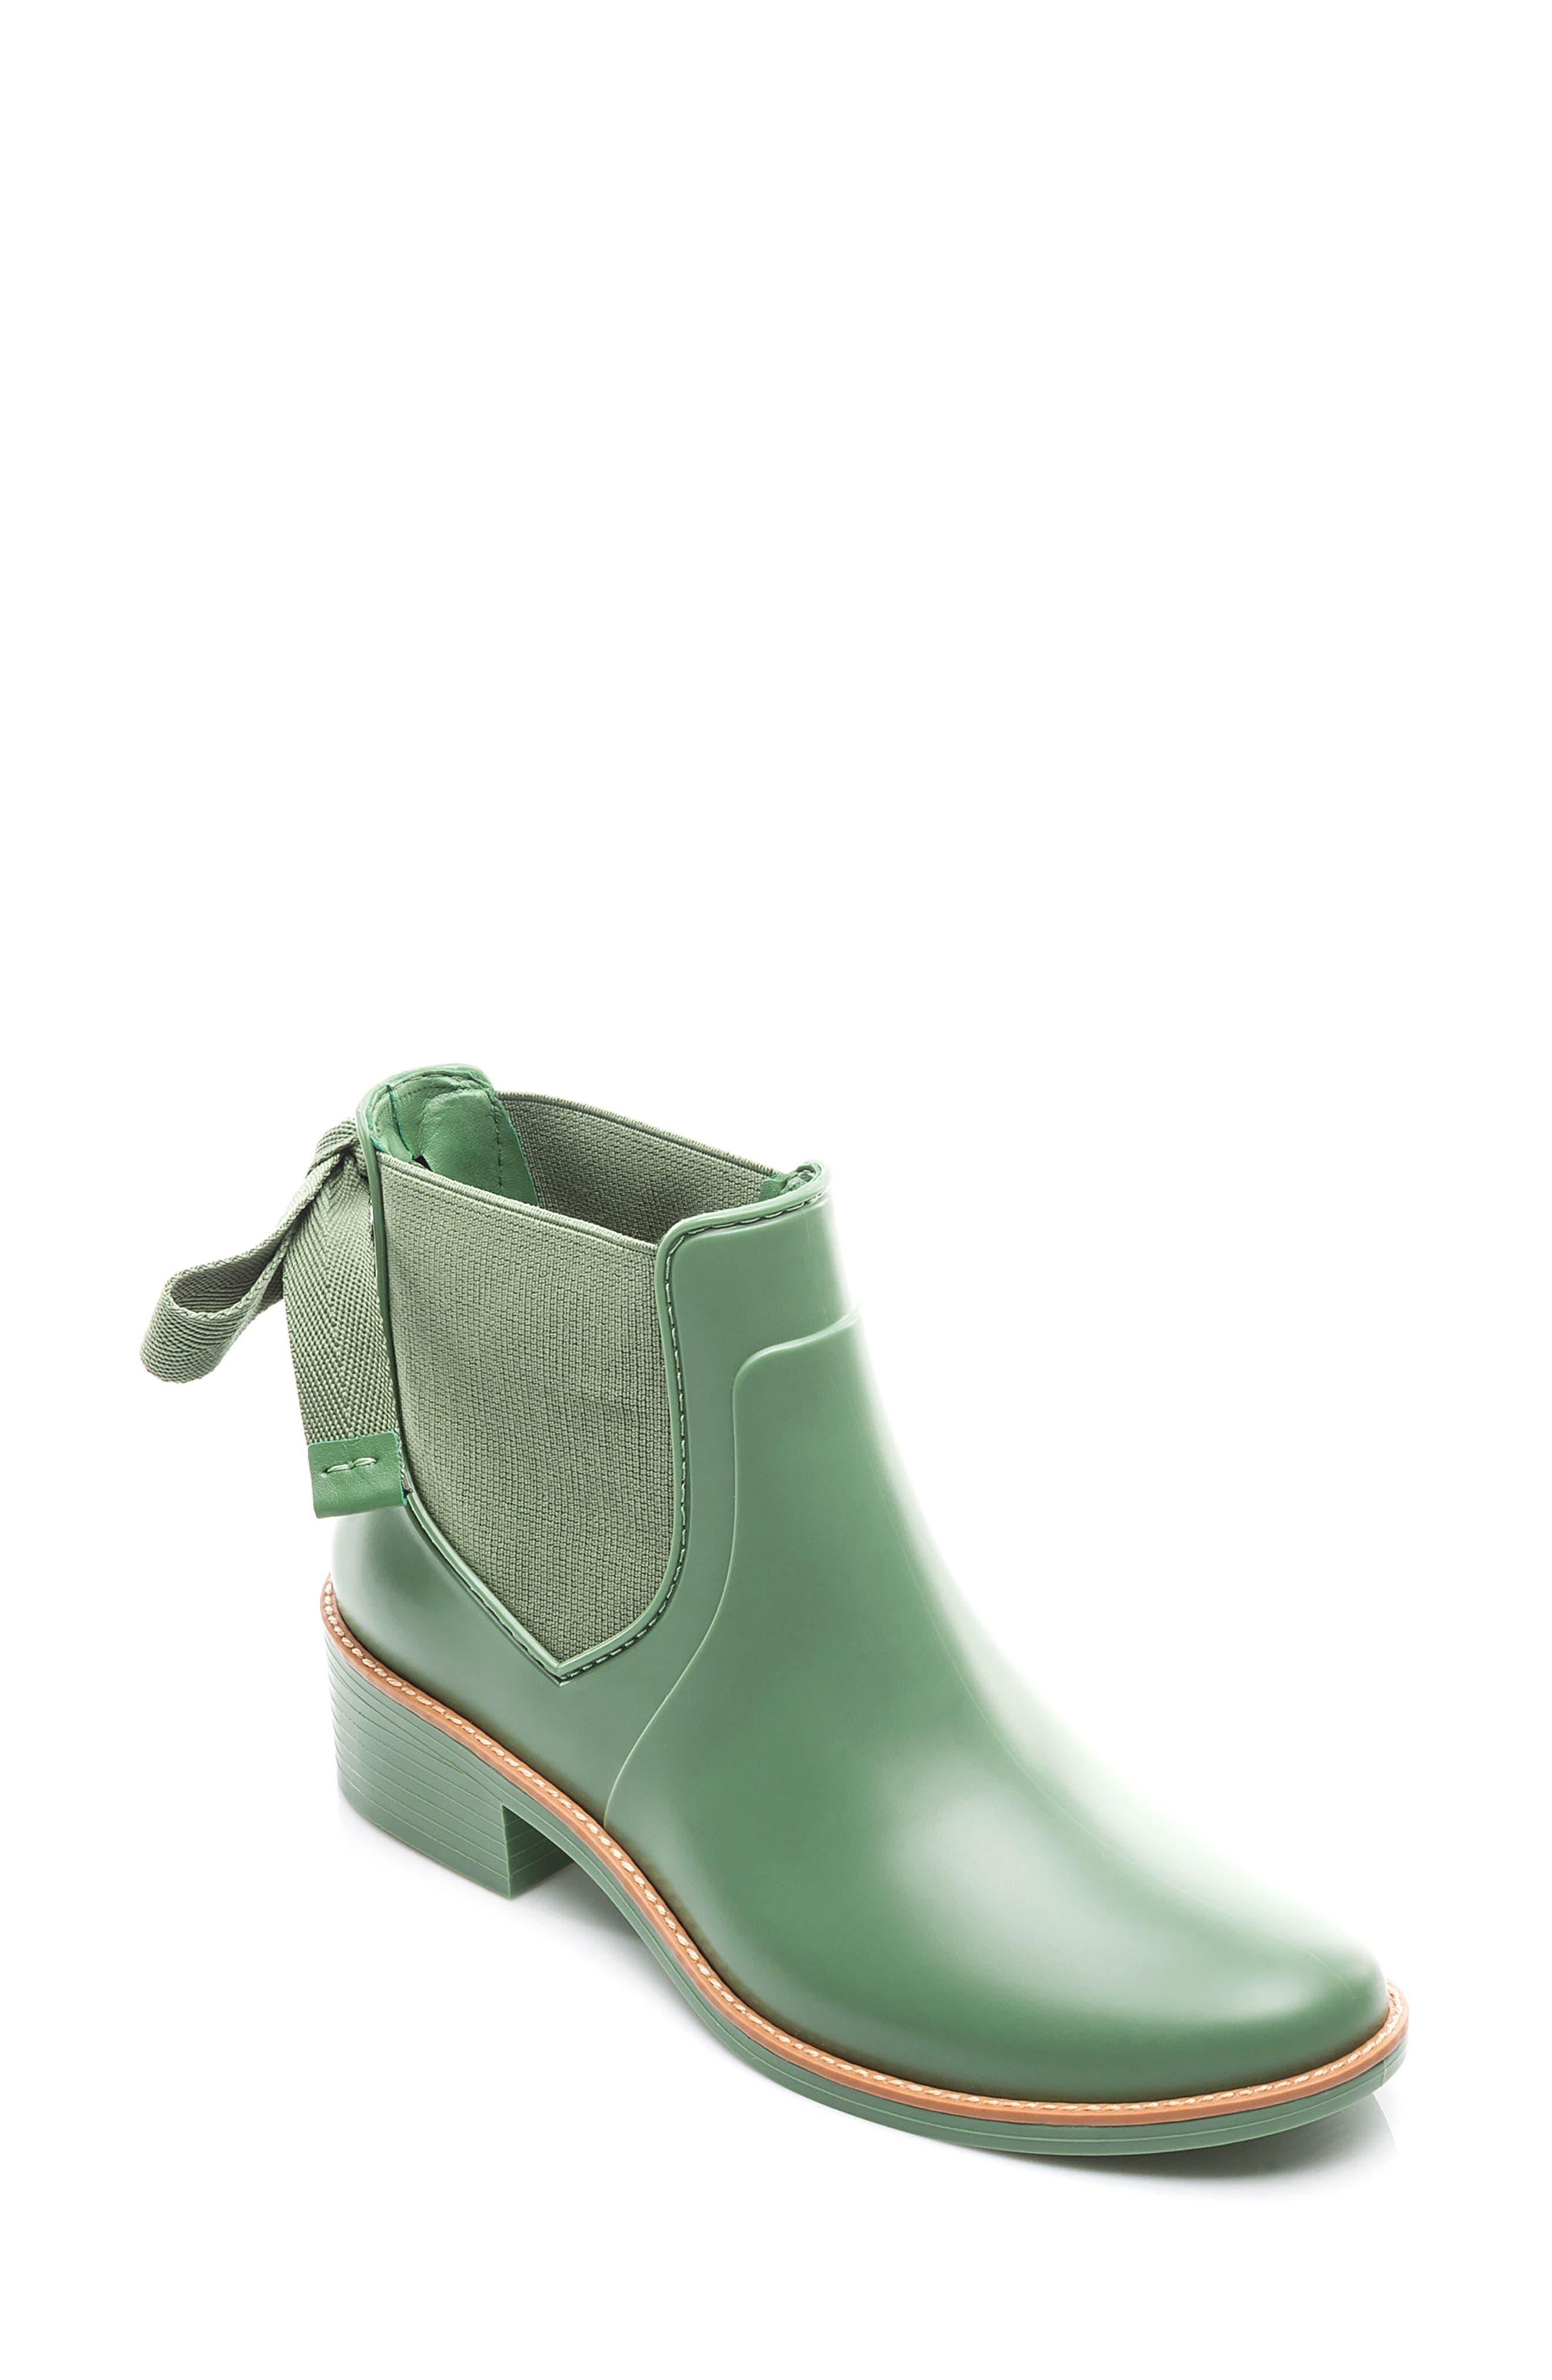 Alternate Image 1 Selected - Bernardo Footwear Paige Rain Boot (Women)